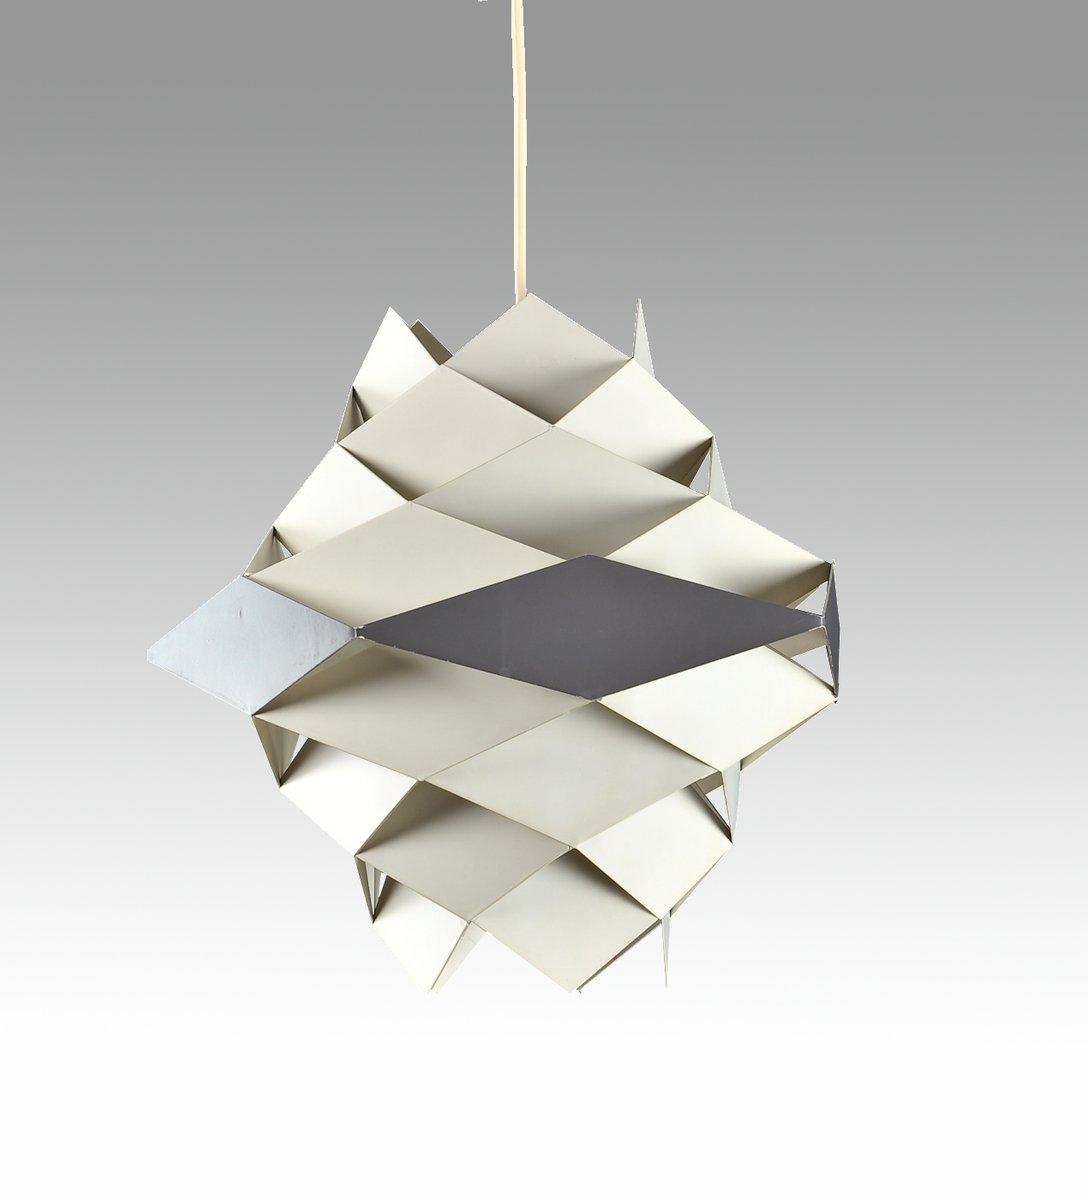 Symfony Pendant Lamp By Preben Dahl For HF Belysning For